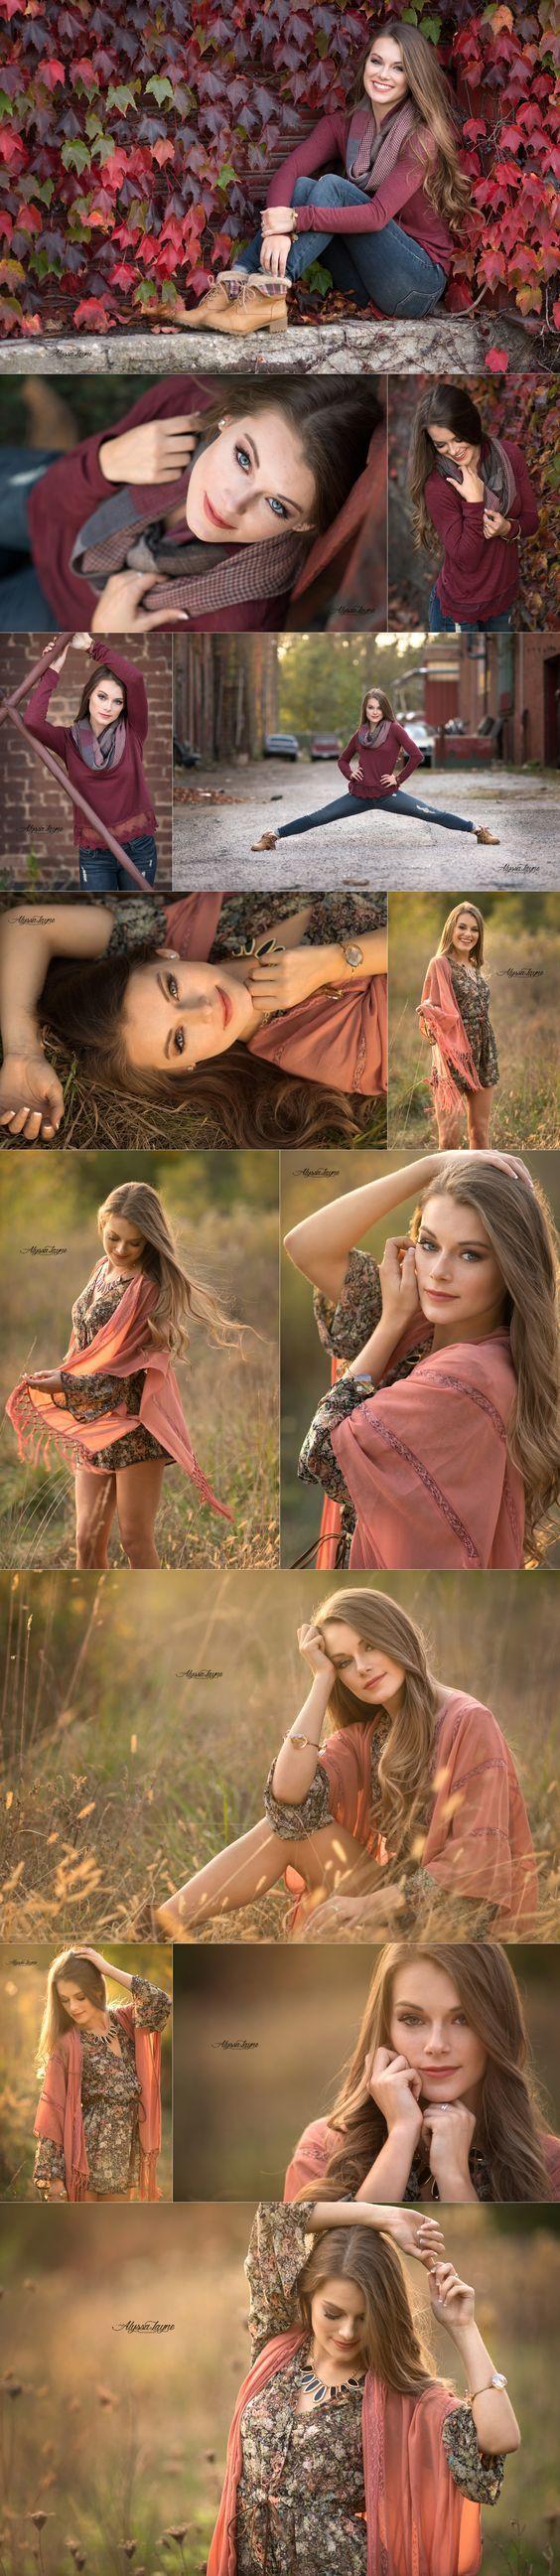 Alyssa Layne Photography | Illinois Senior Photographer | Senior Poses| Ballerina Poses | Class of 2016 | Carlee | Highschool Senior Photographer | Senior Pictures